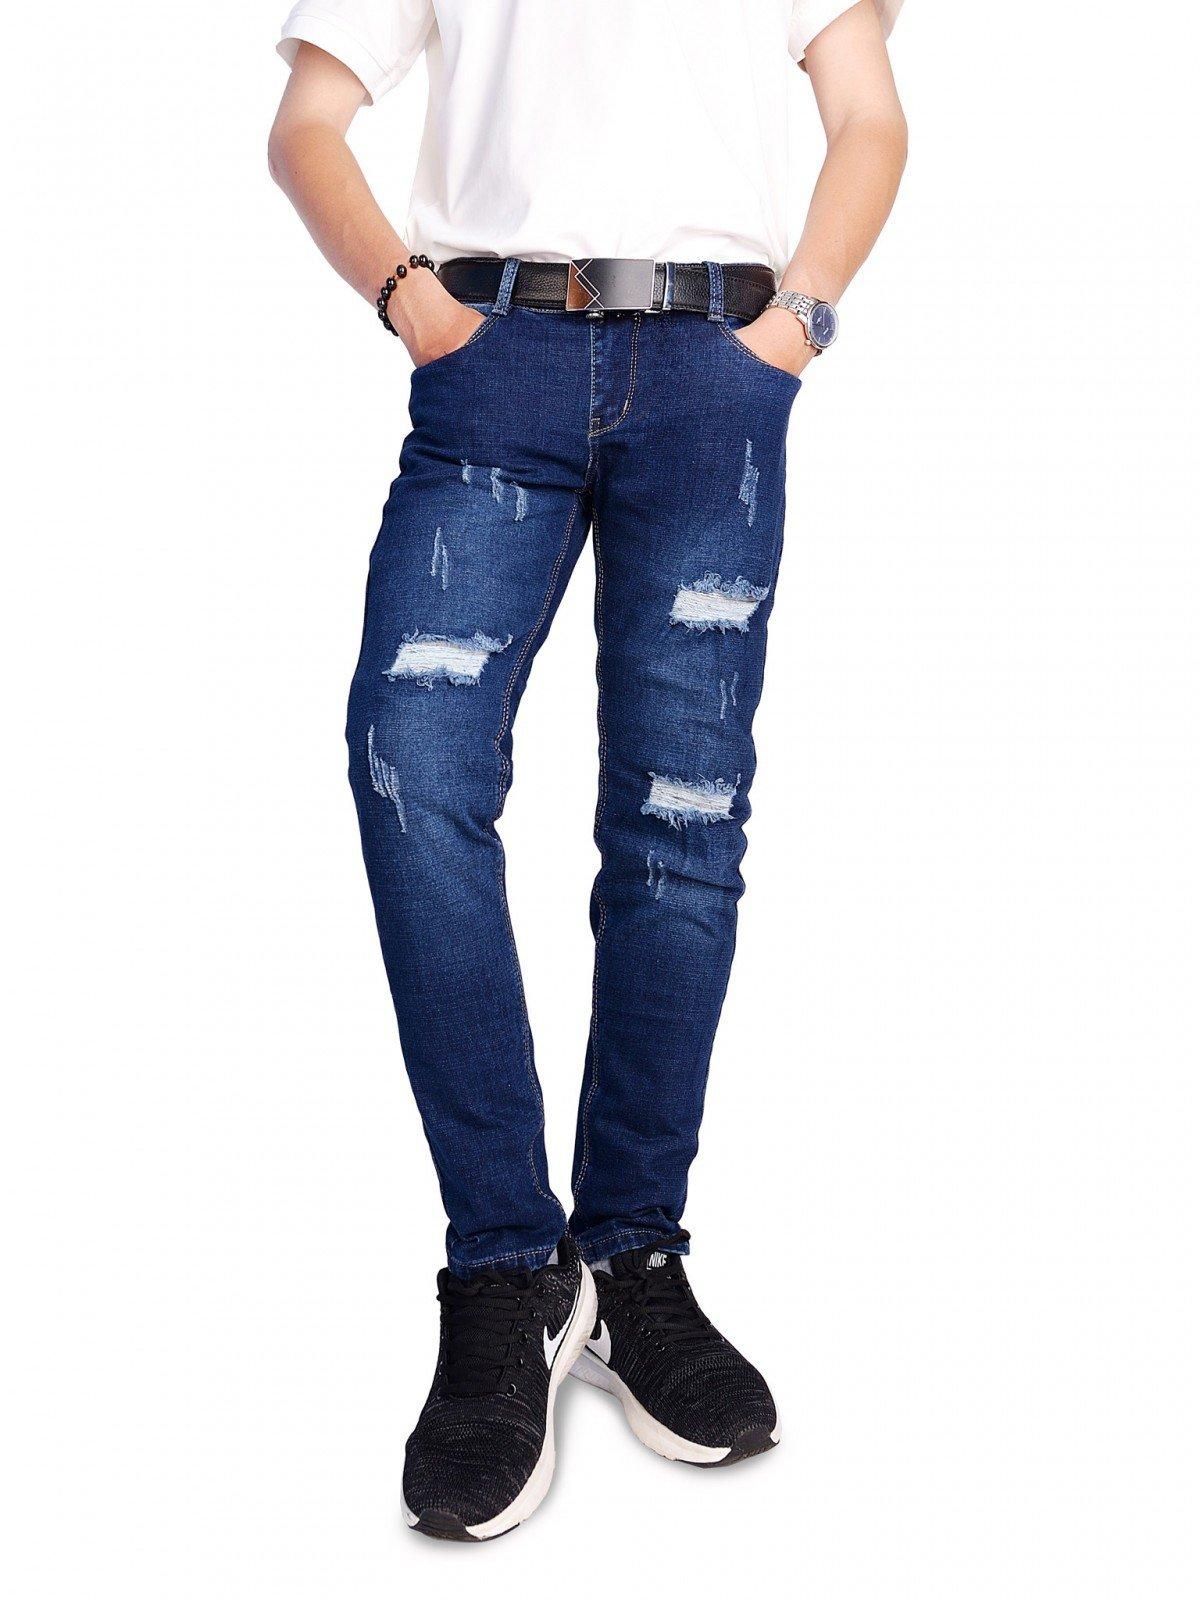 jeans nam rach goi